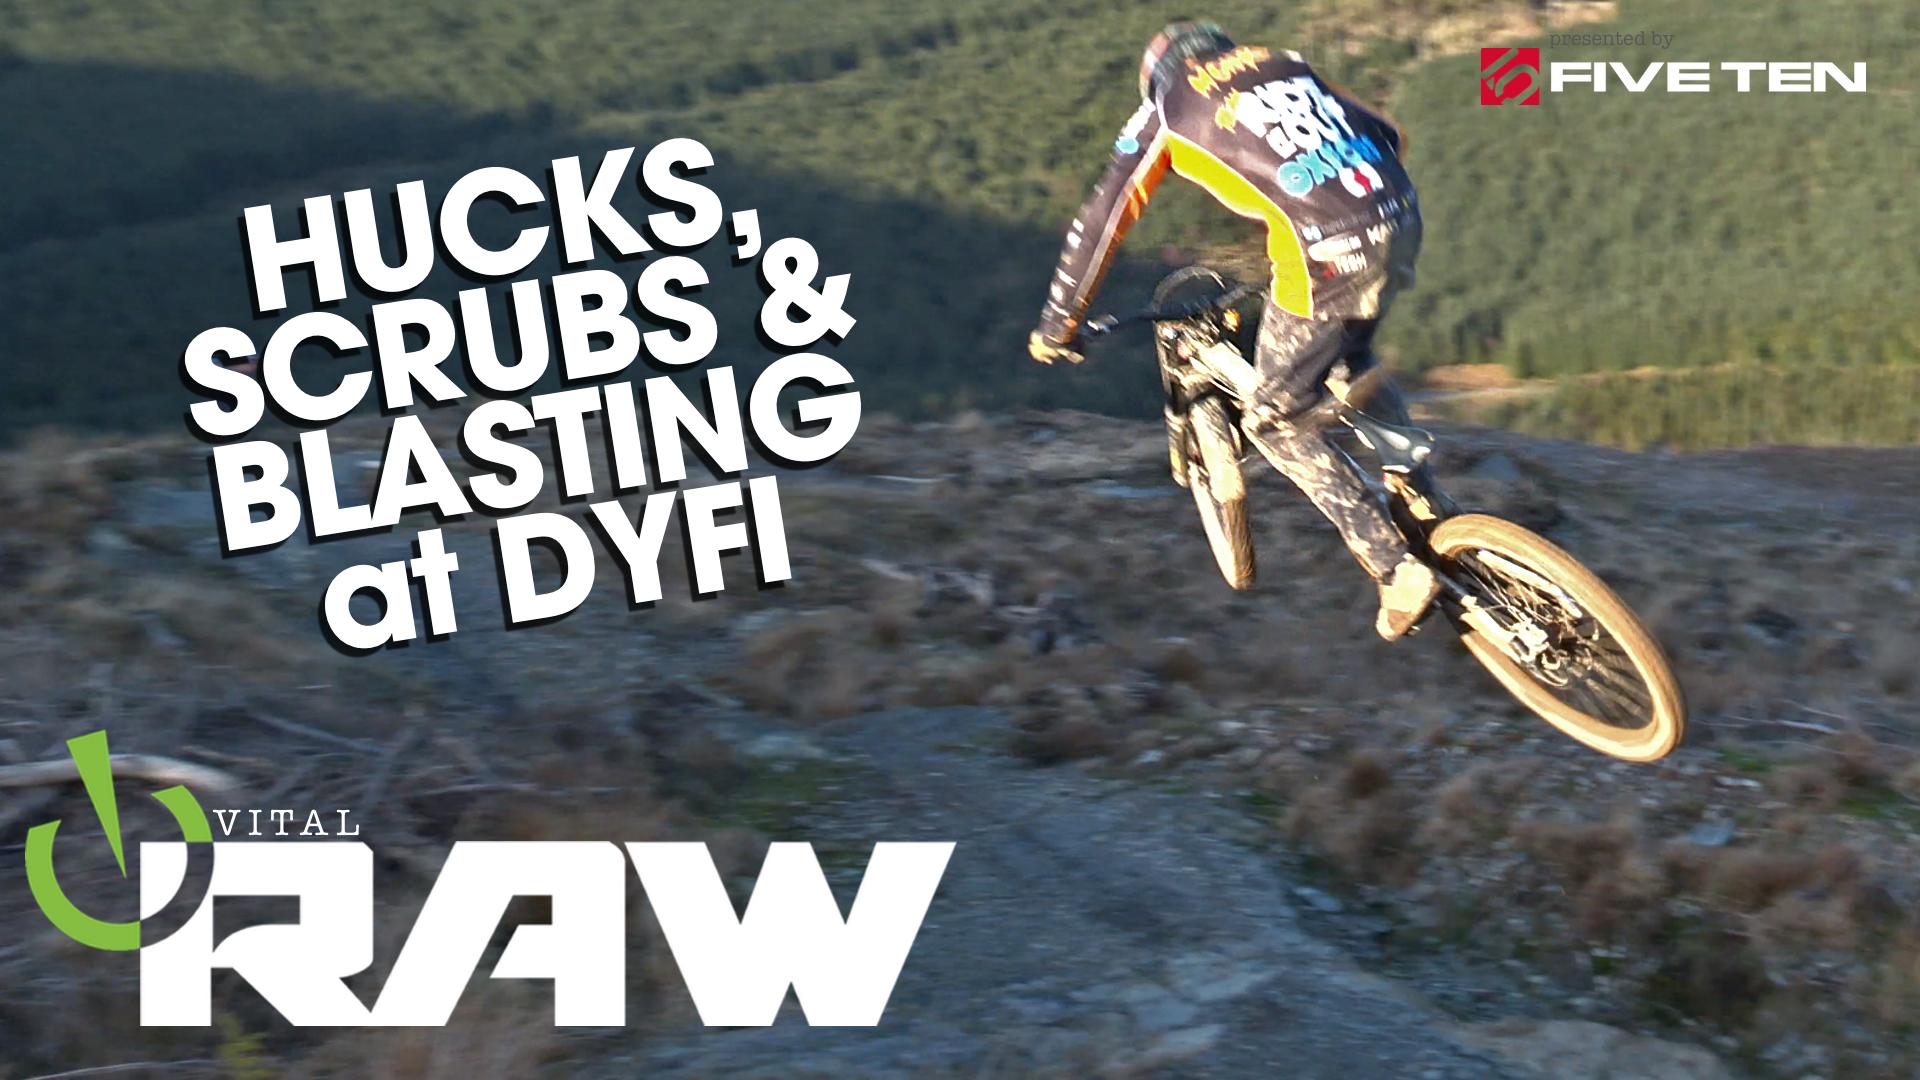 DFYI Gone Wild - Vital RAW with Jim Monro and Crew